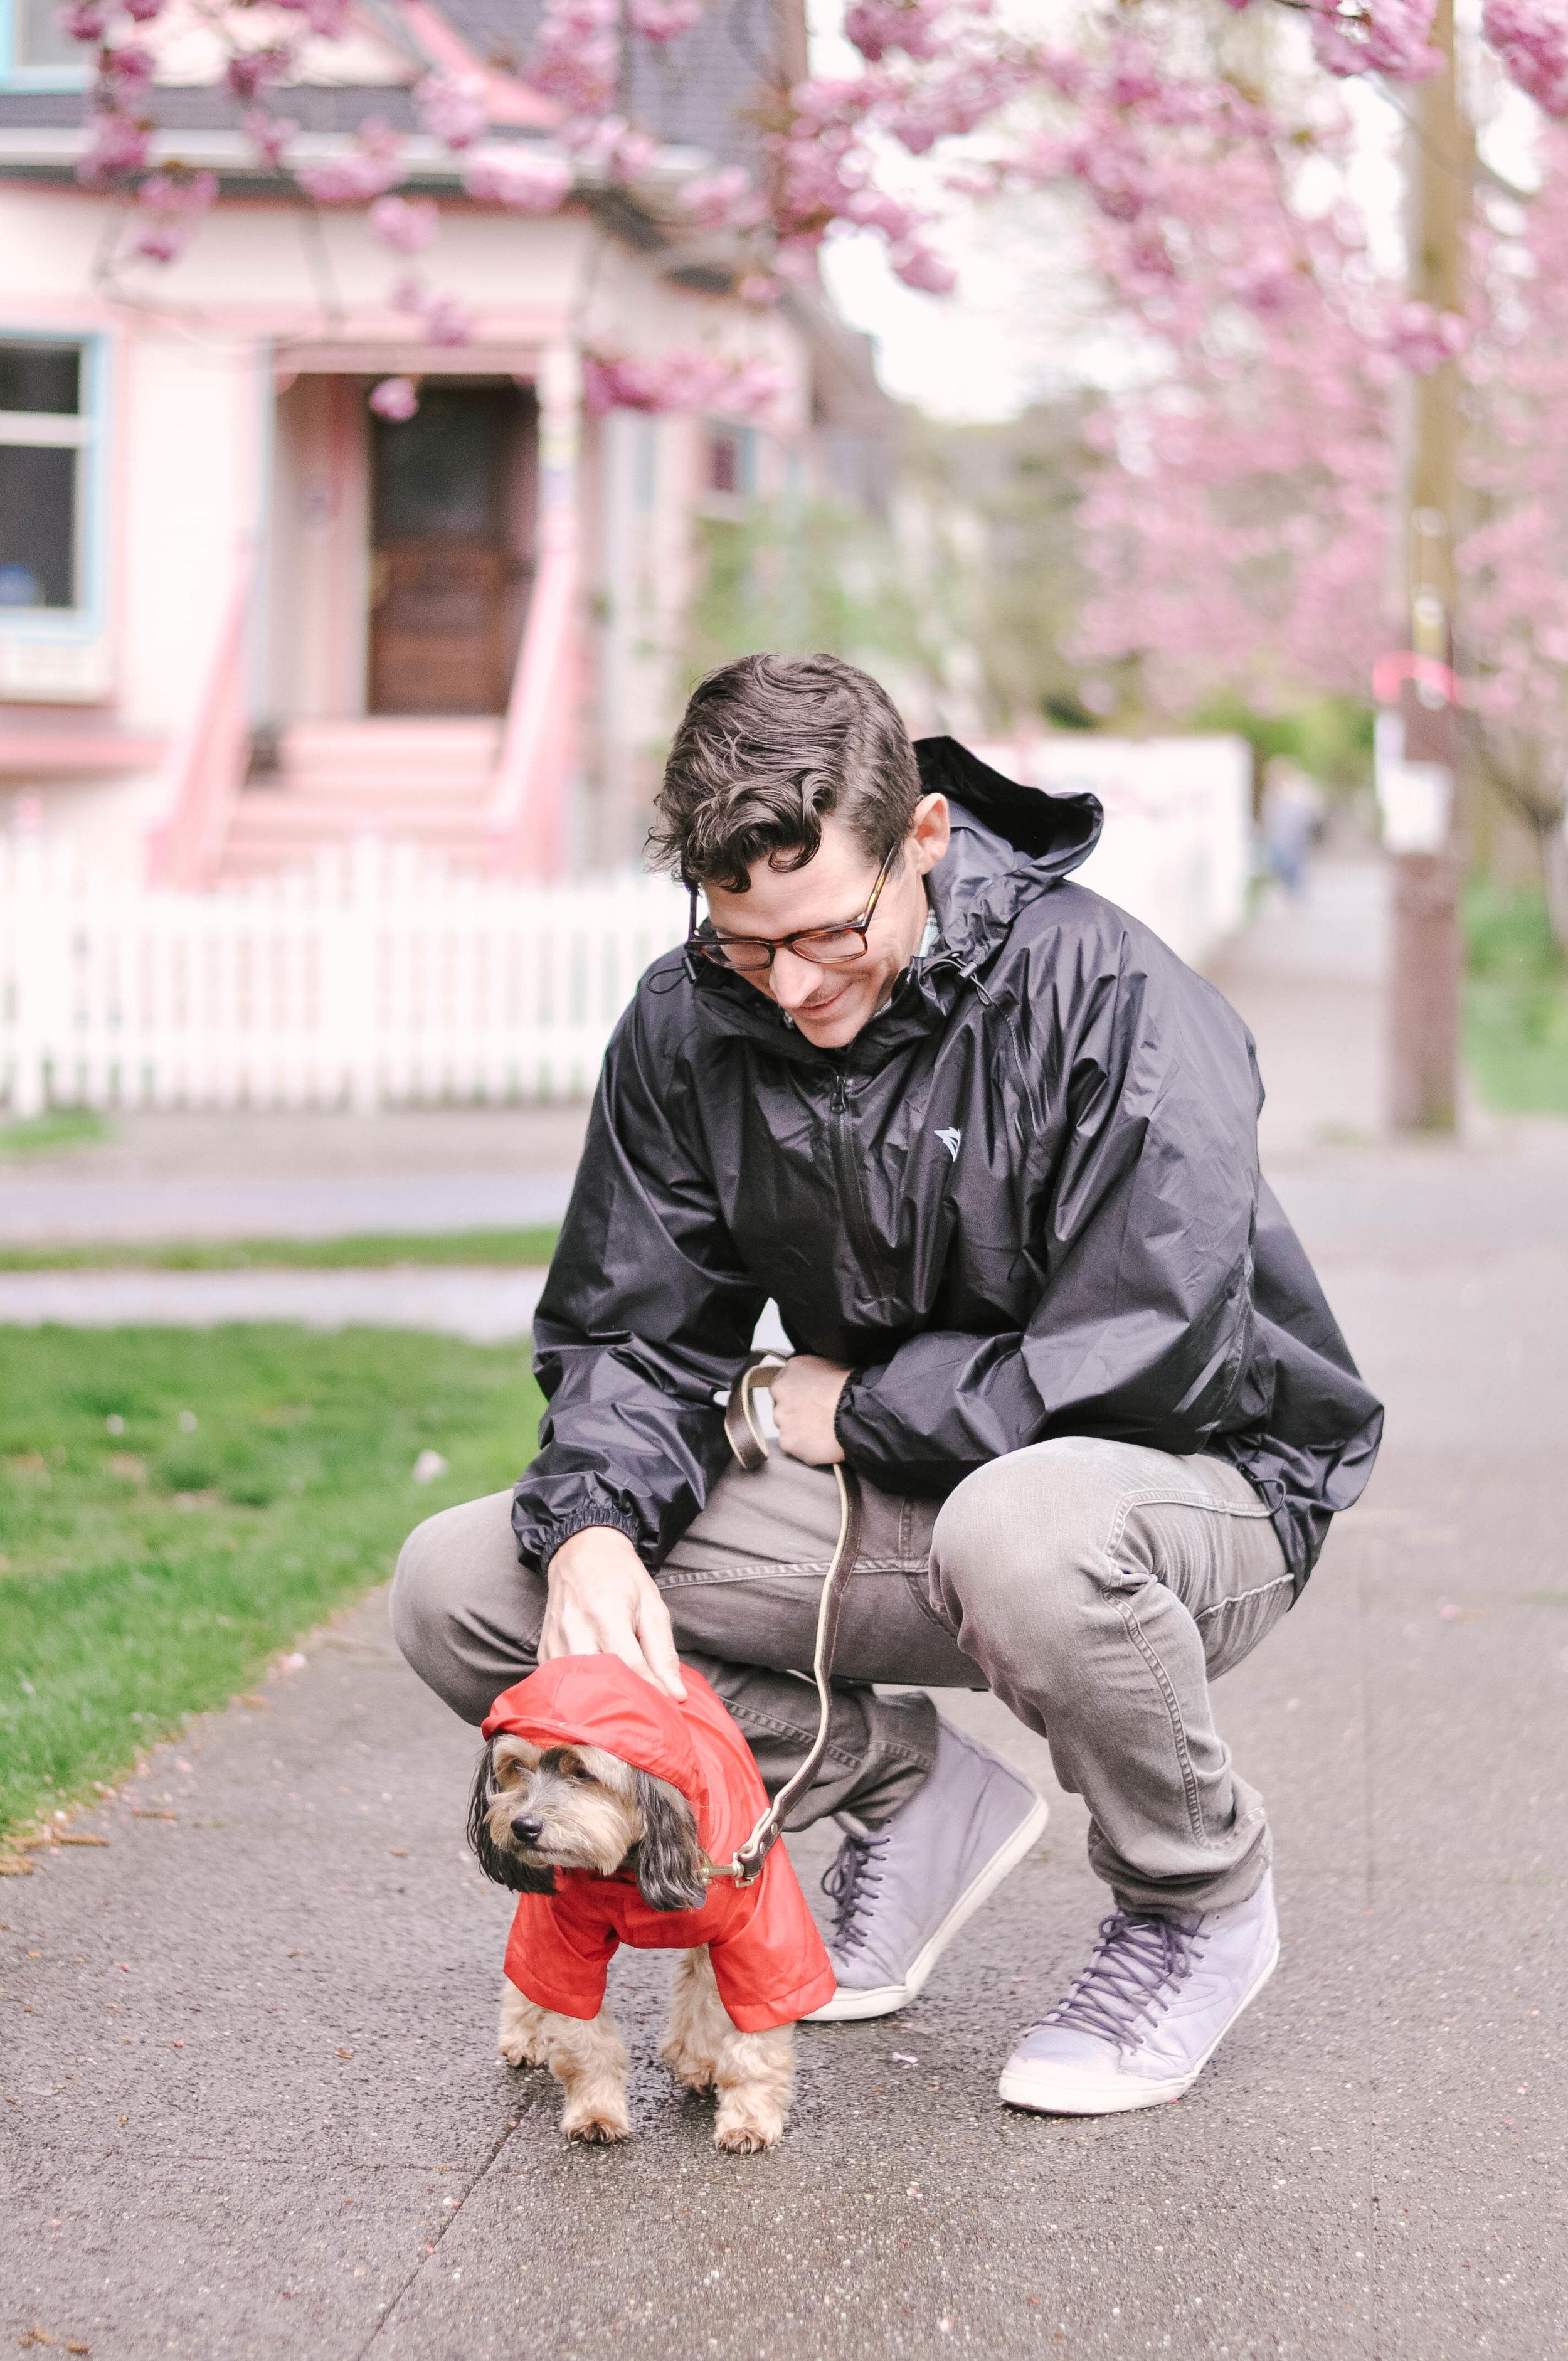 Man bending down to pet dog in raincoat